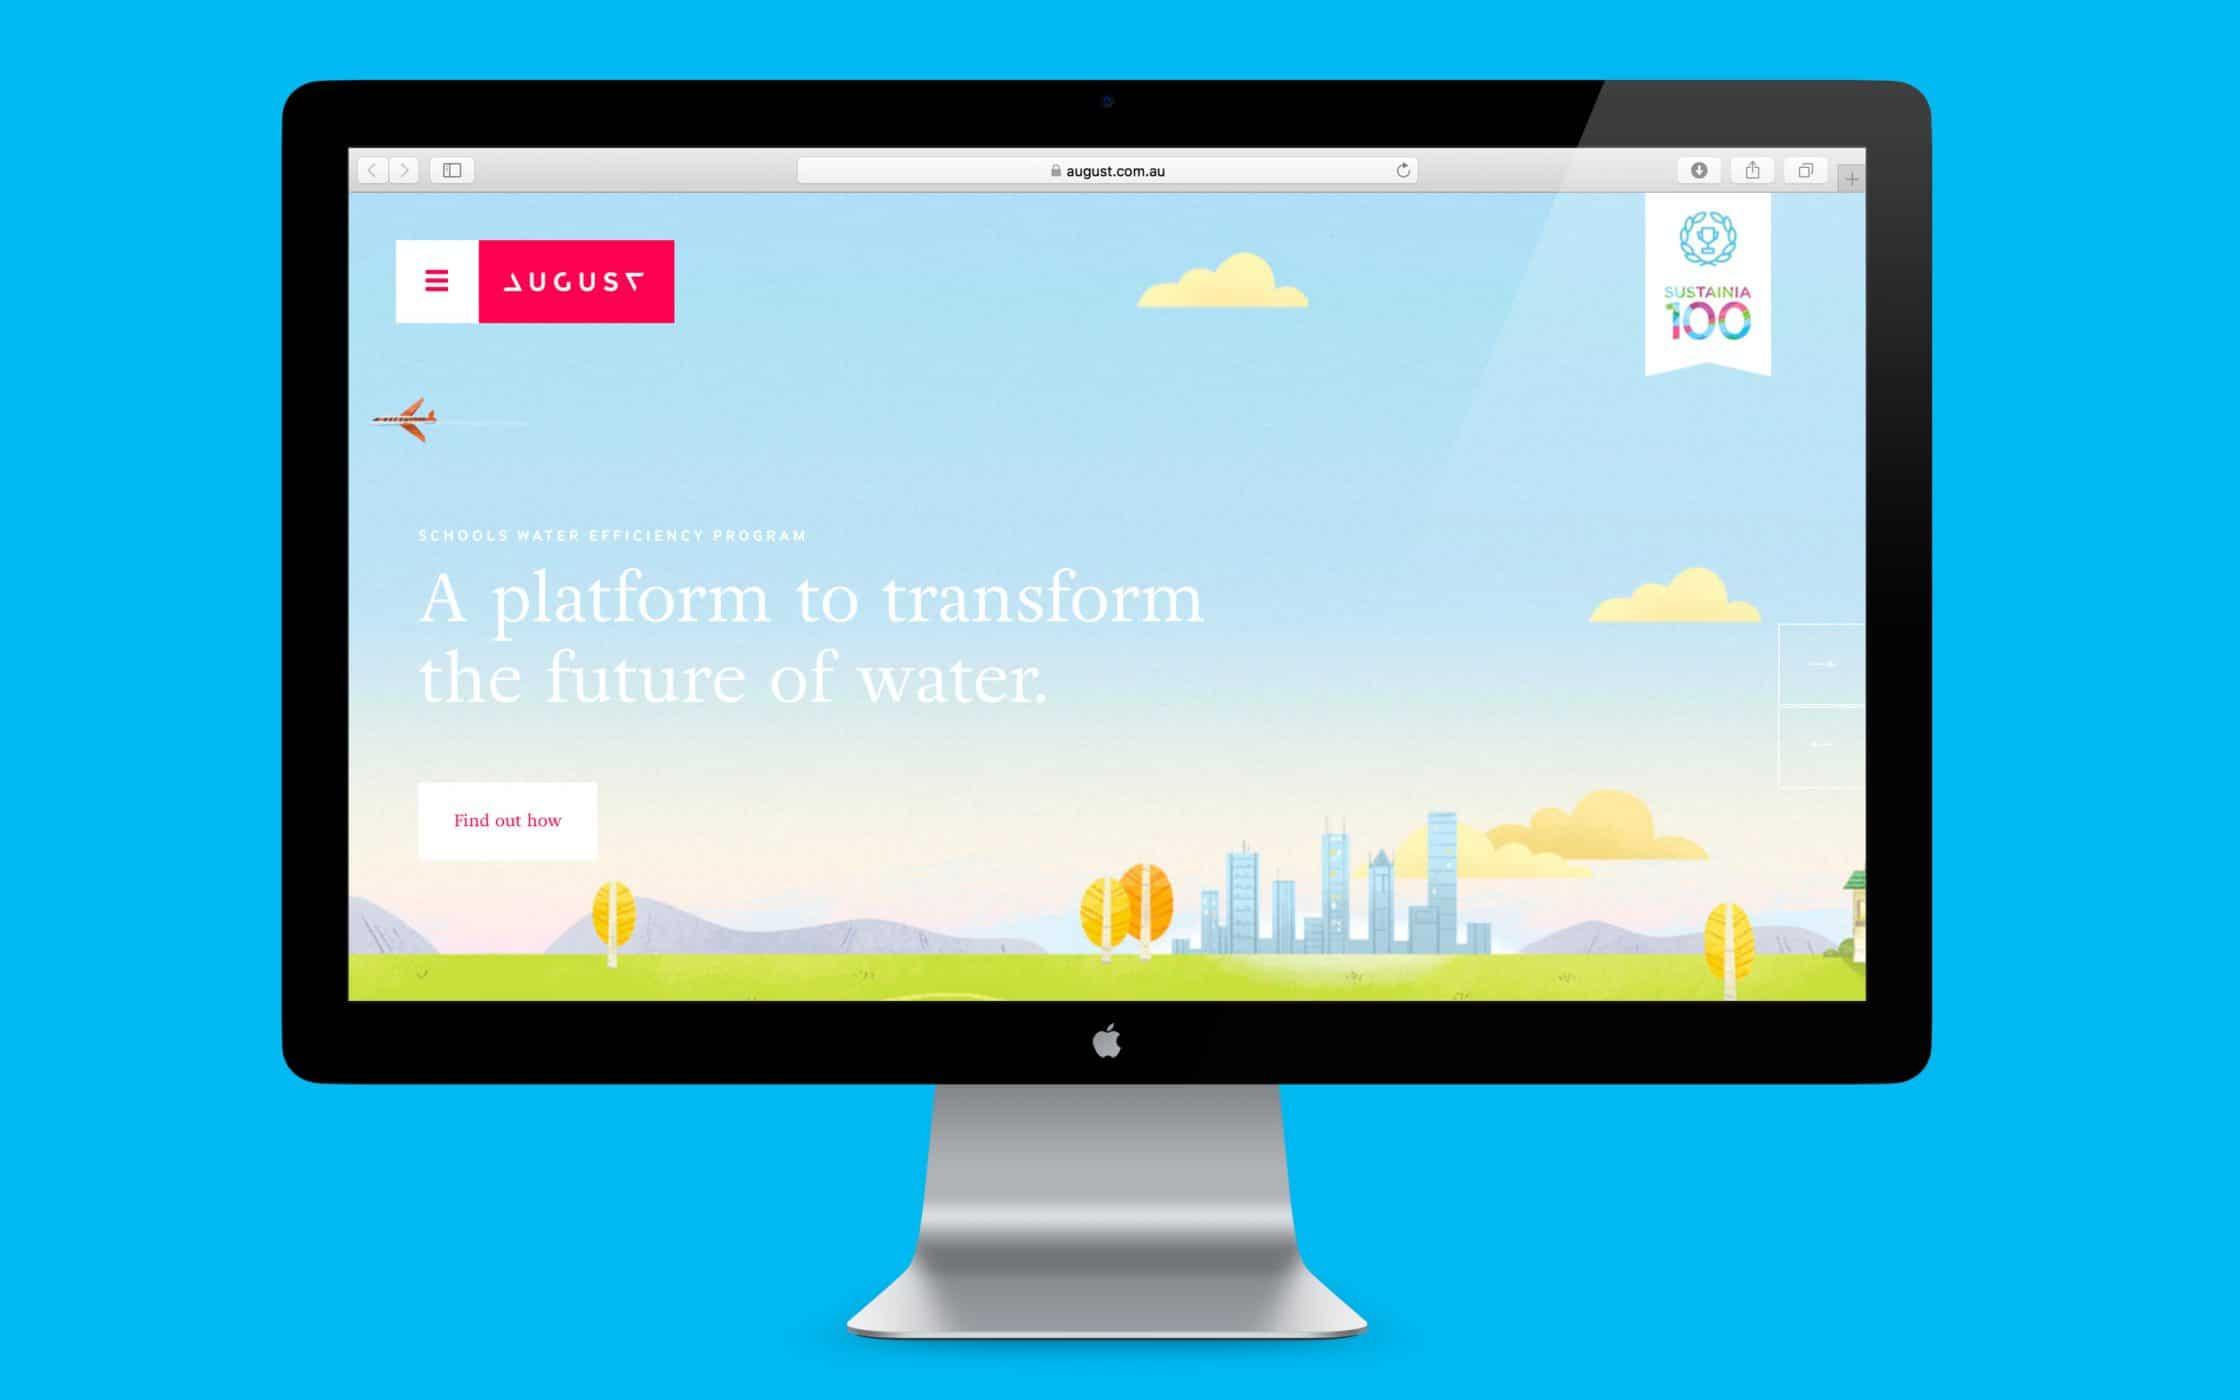 Web Design Trends 2017